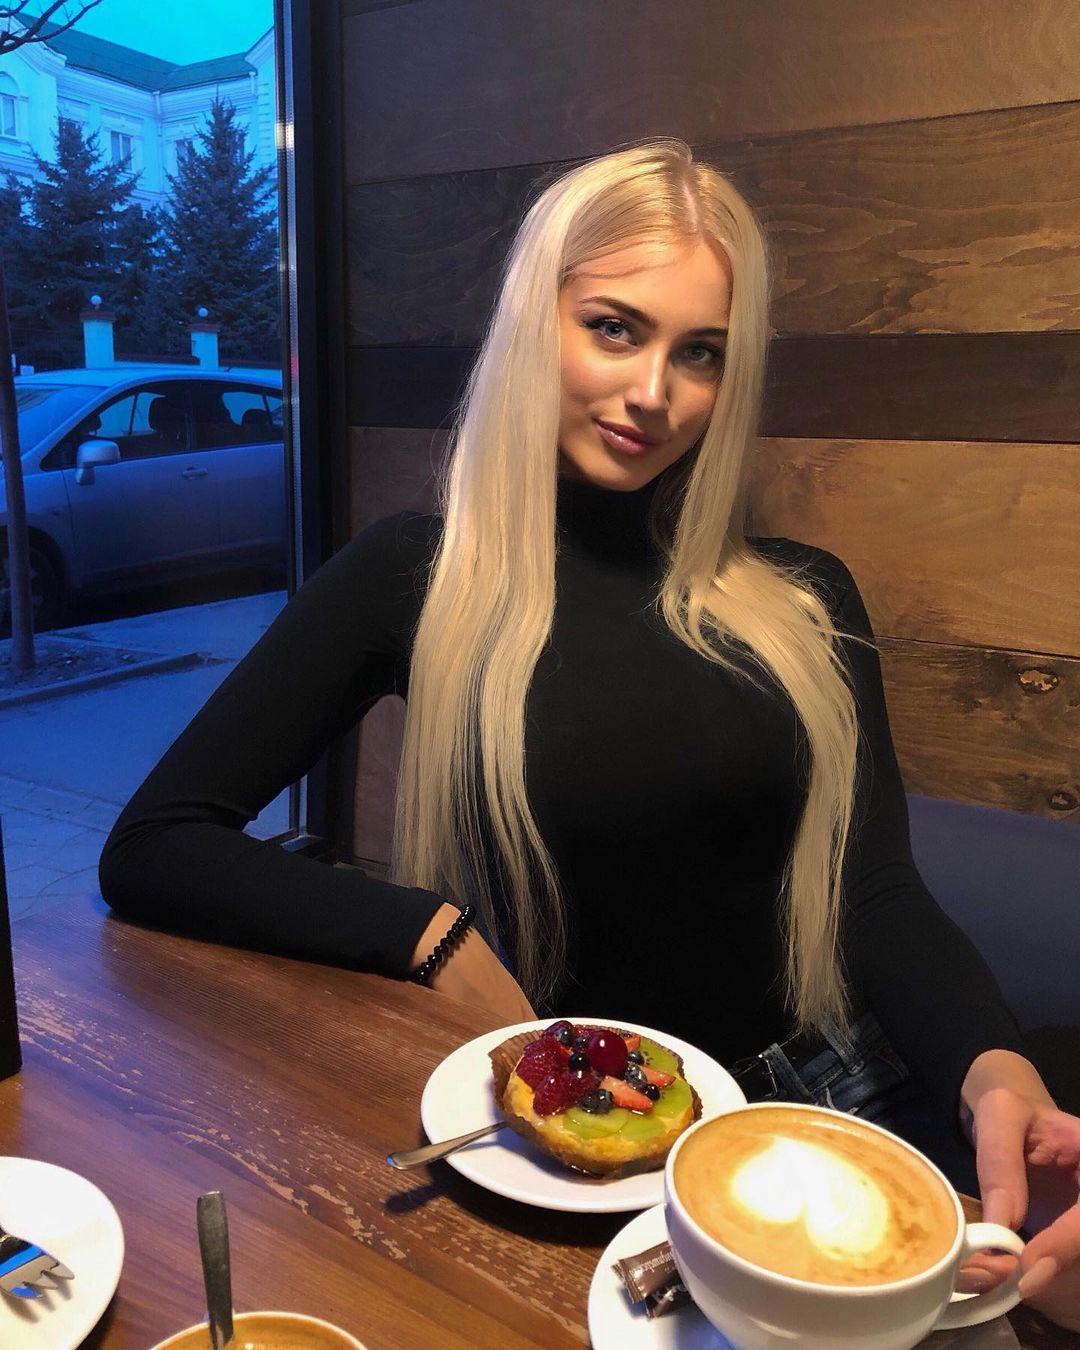 Anastasia-Babich-Wallpapers-Insta-Fit-Bio-2